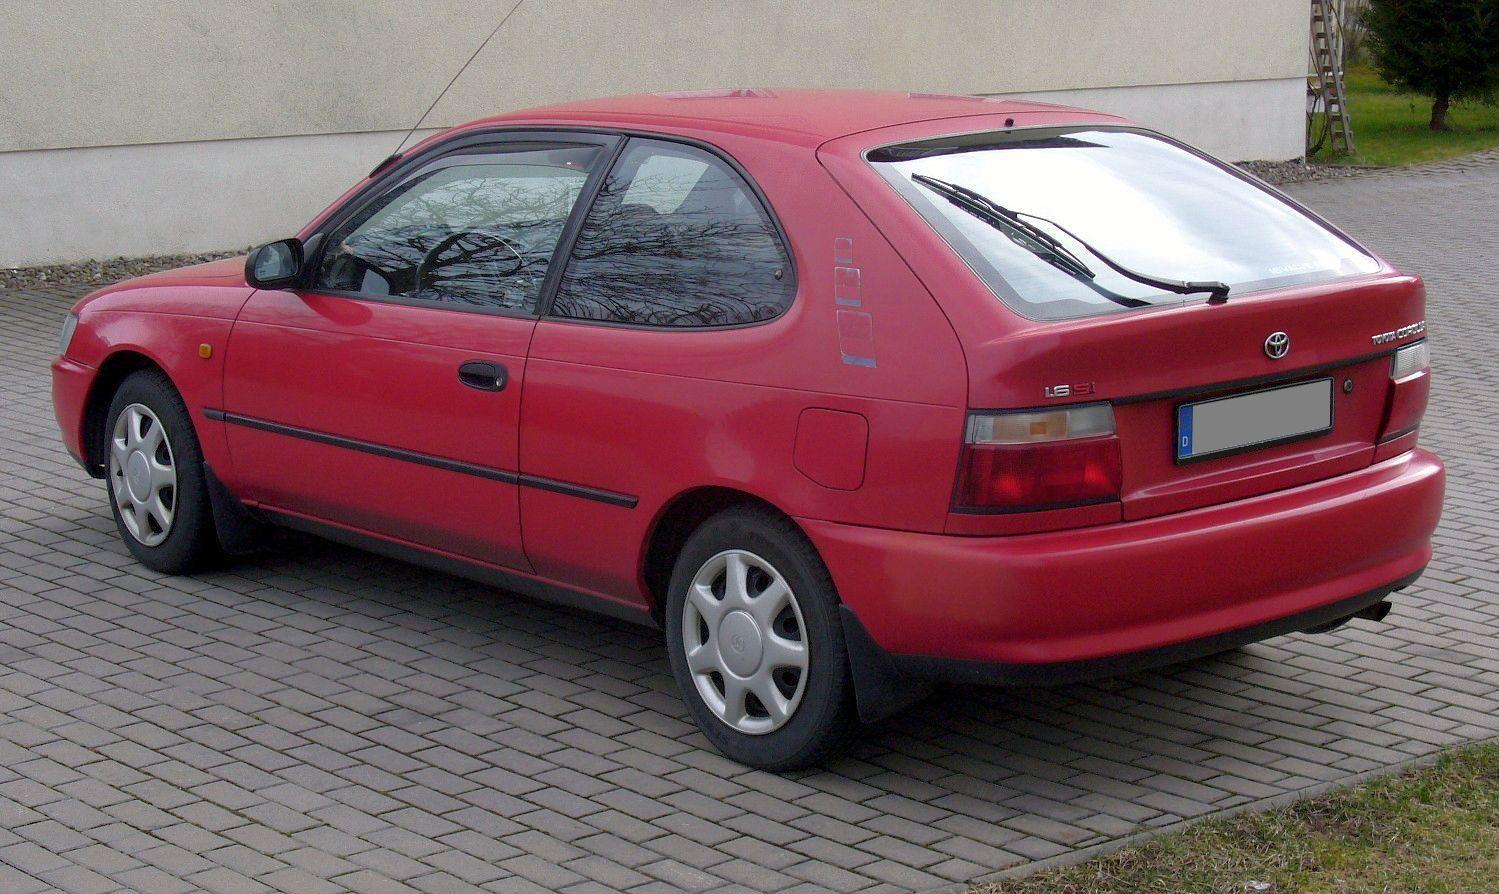 Wow  Toyota Corolla (E100) - 1 6 Si Heck 3-door Euro